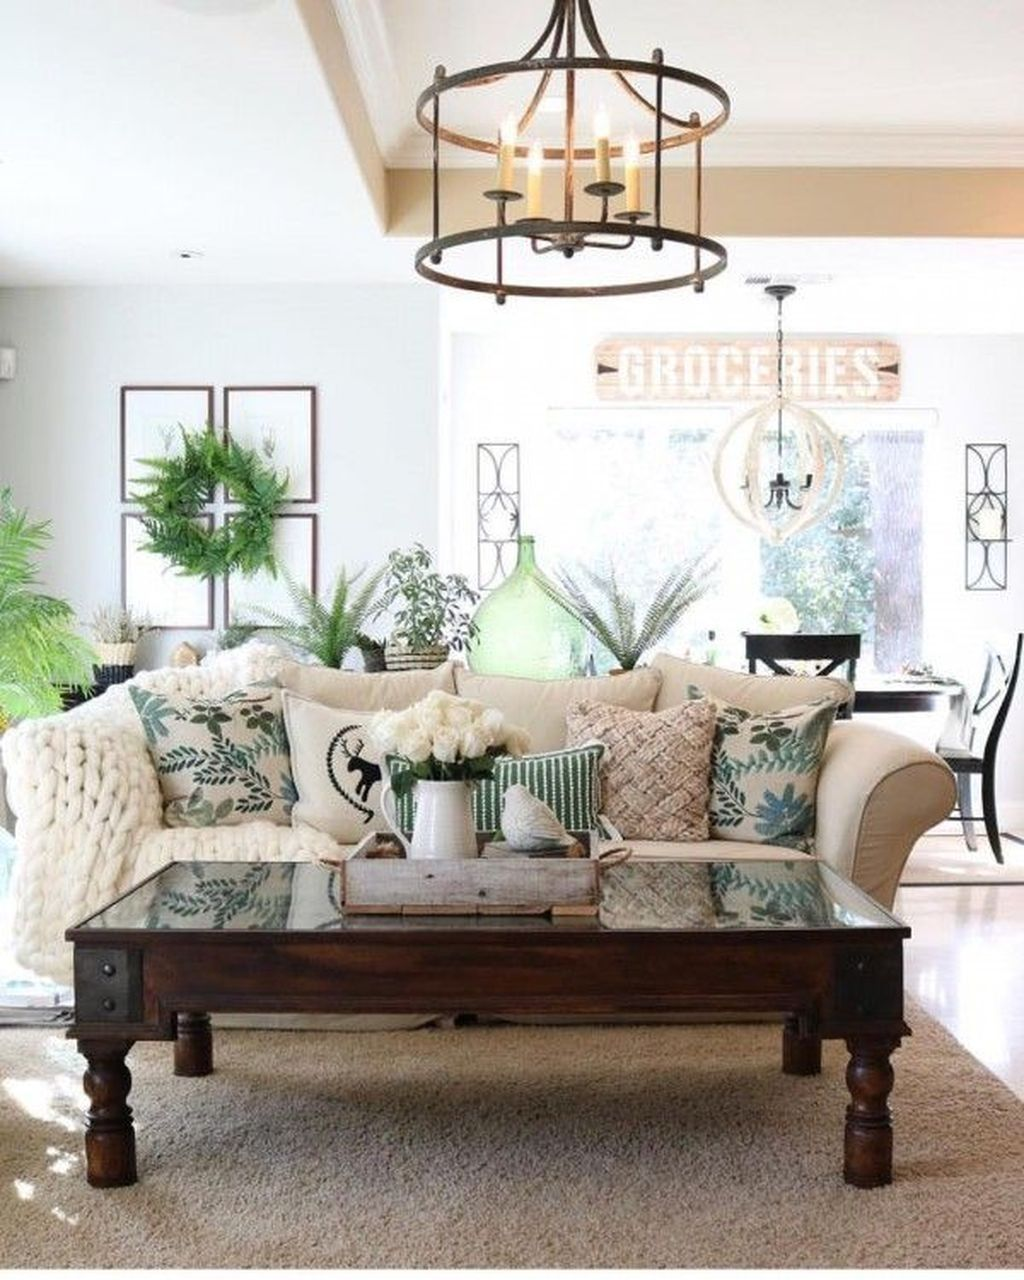 Cool Living Room Decorating Ideas: Cool Farmhouse Living Room Decor Ideas 25